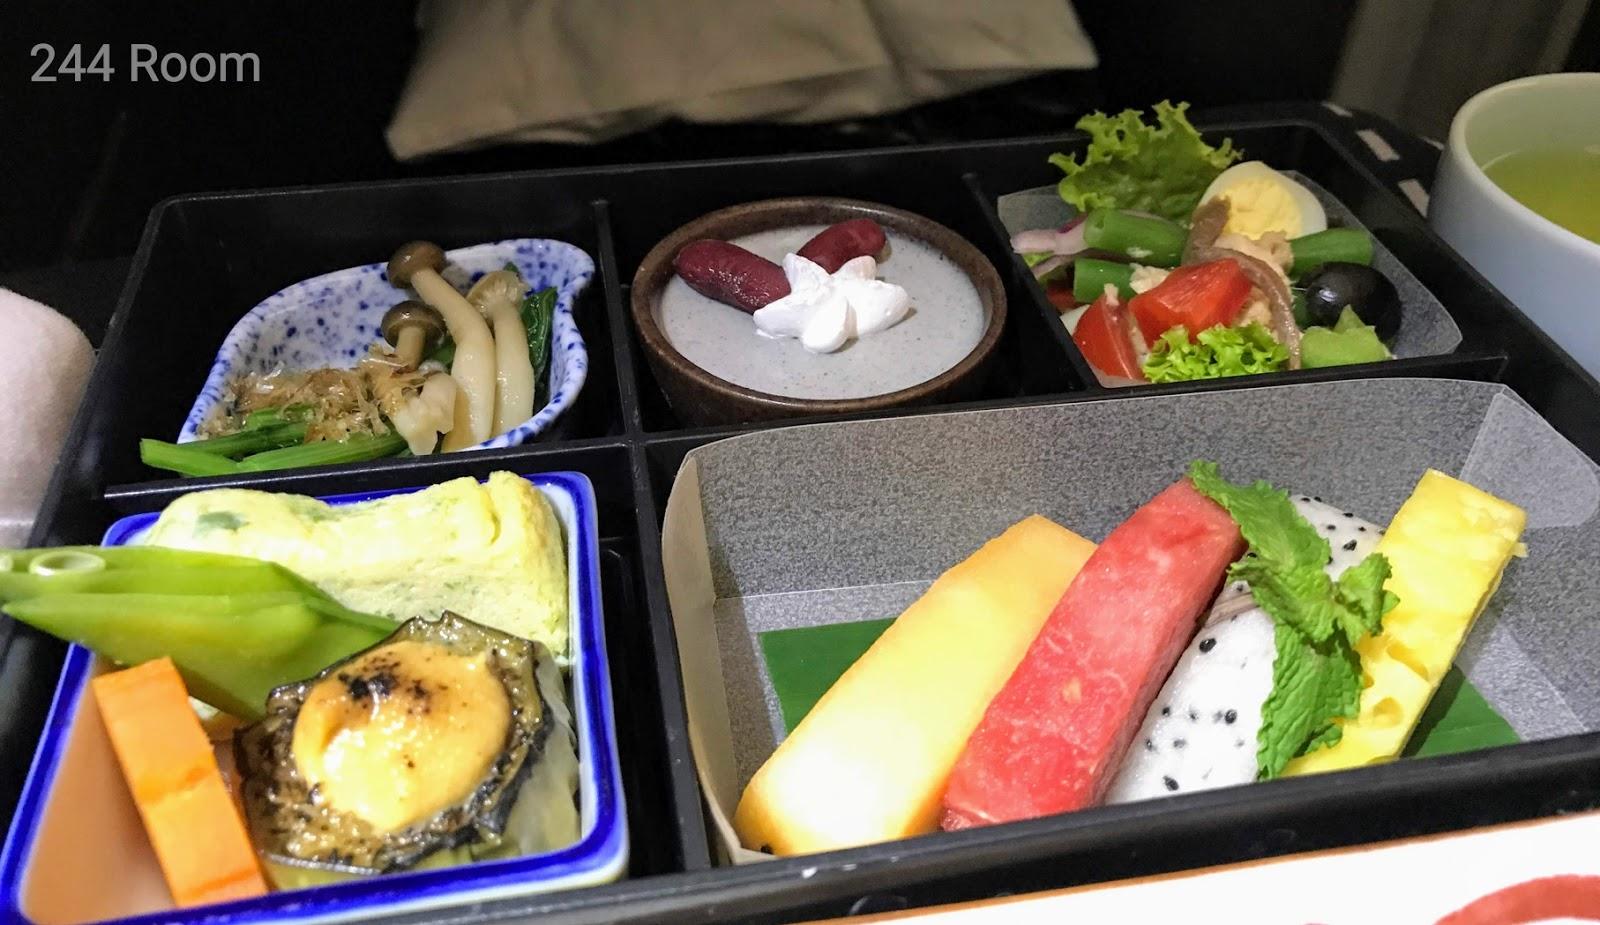 JALビジネスクラスシート機内食4 Business class flight meal